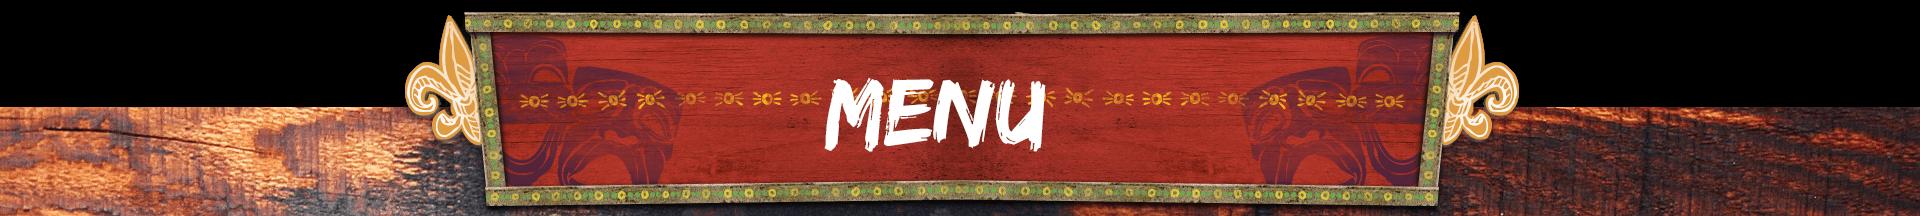 menu2.min.png